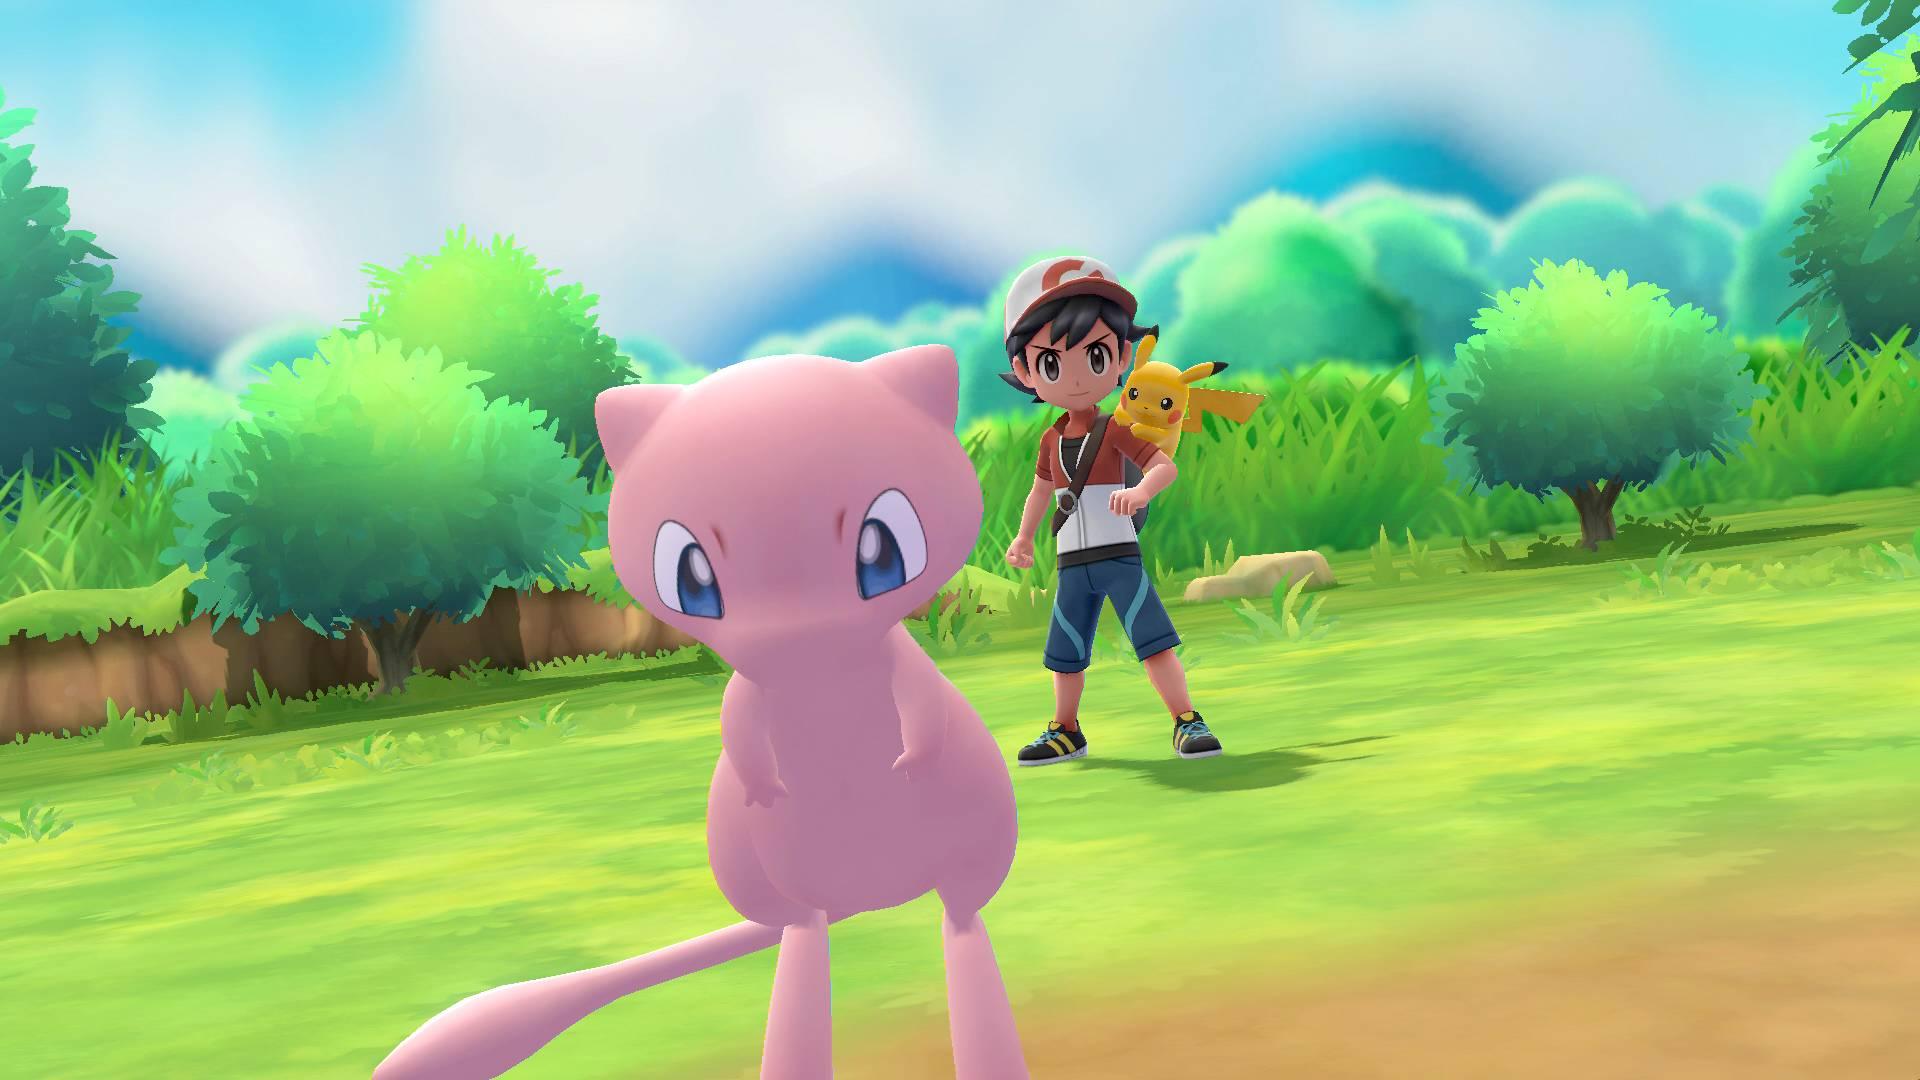 Pokémon: Let's Go Mew